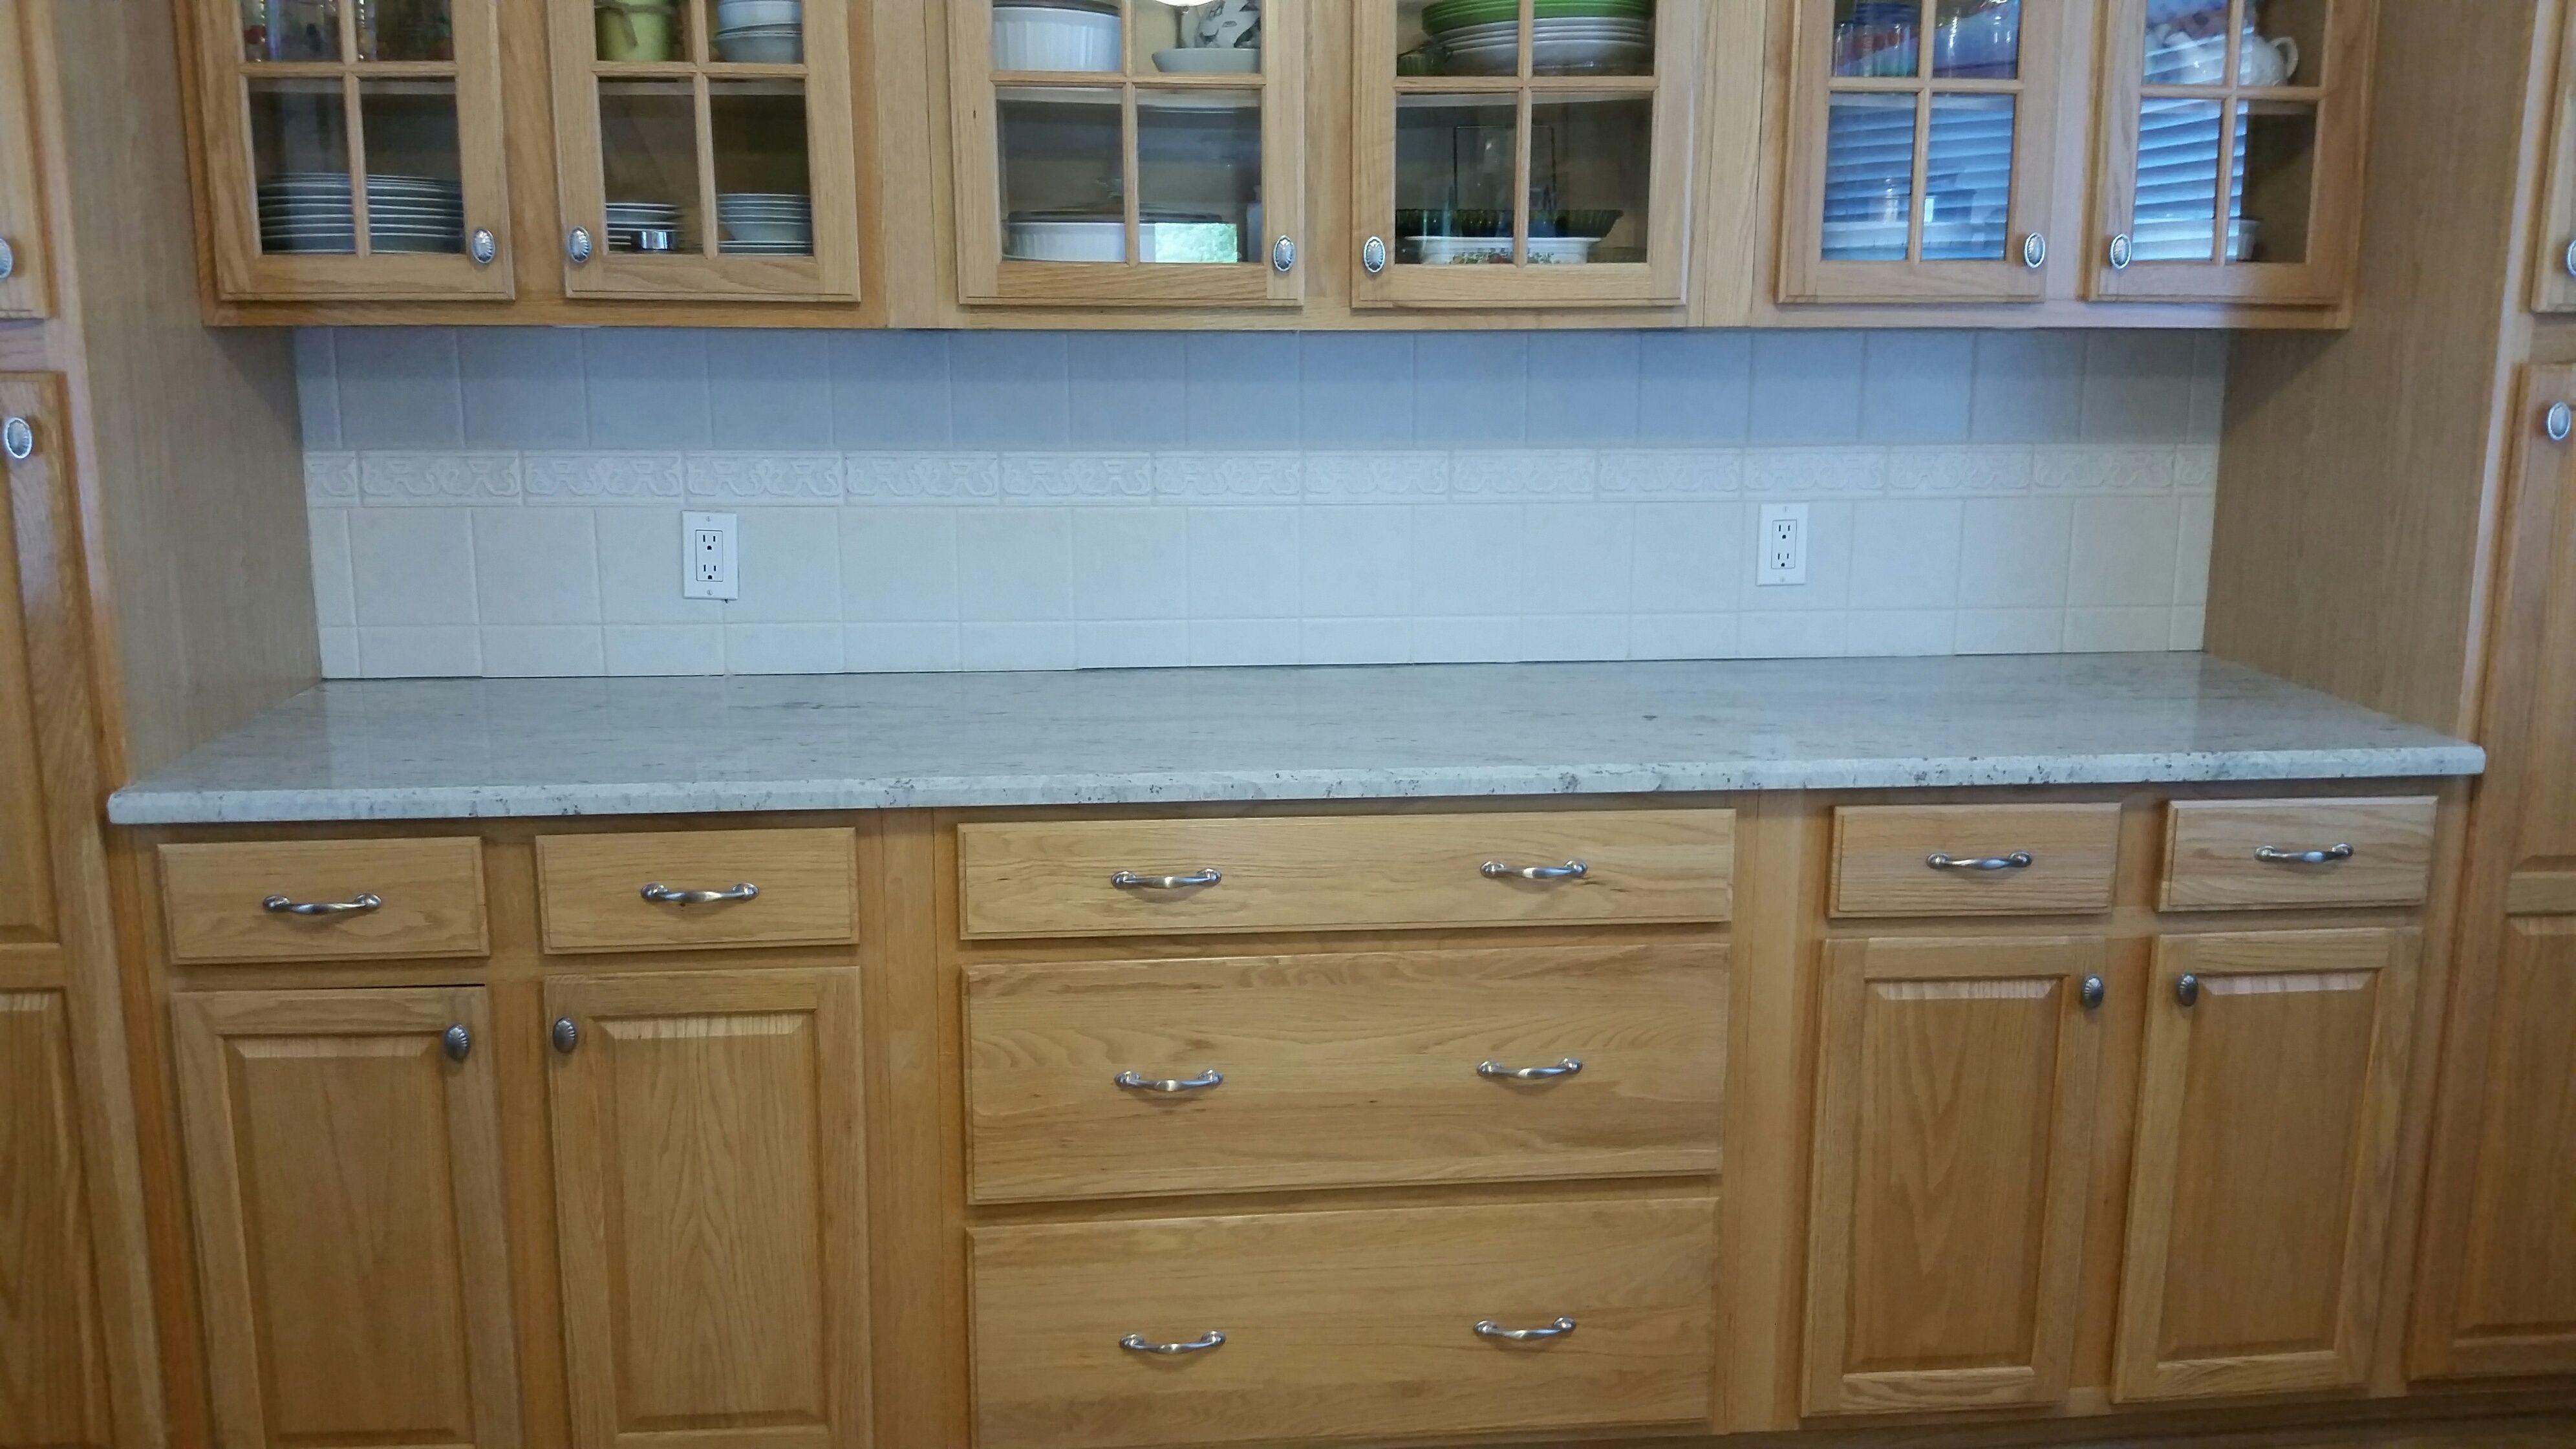 River White granite kitchen countertop install. Knoxville\'s Stone ...